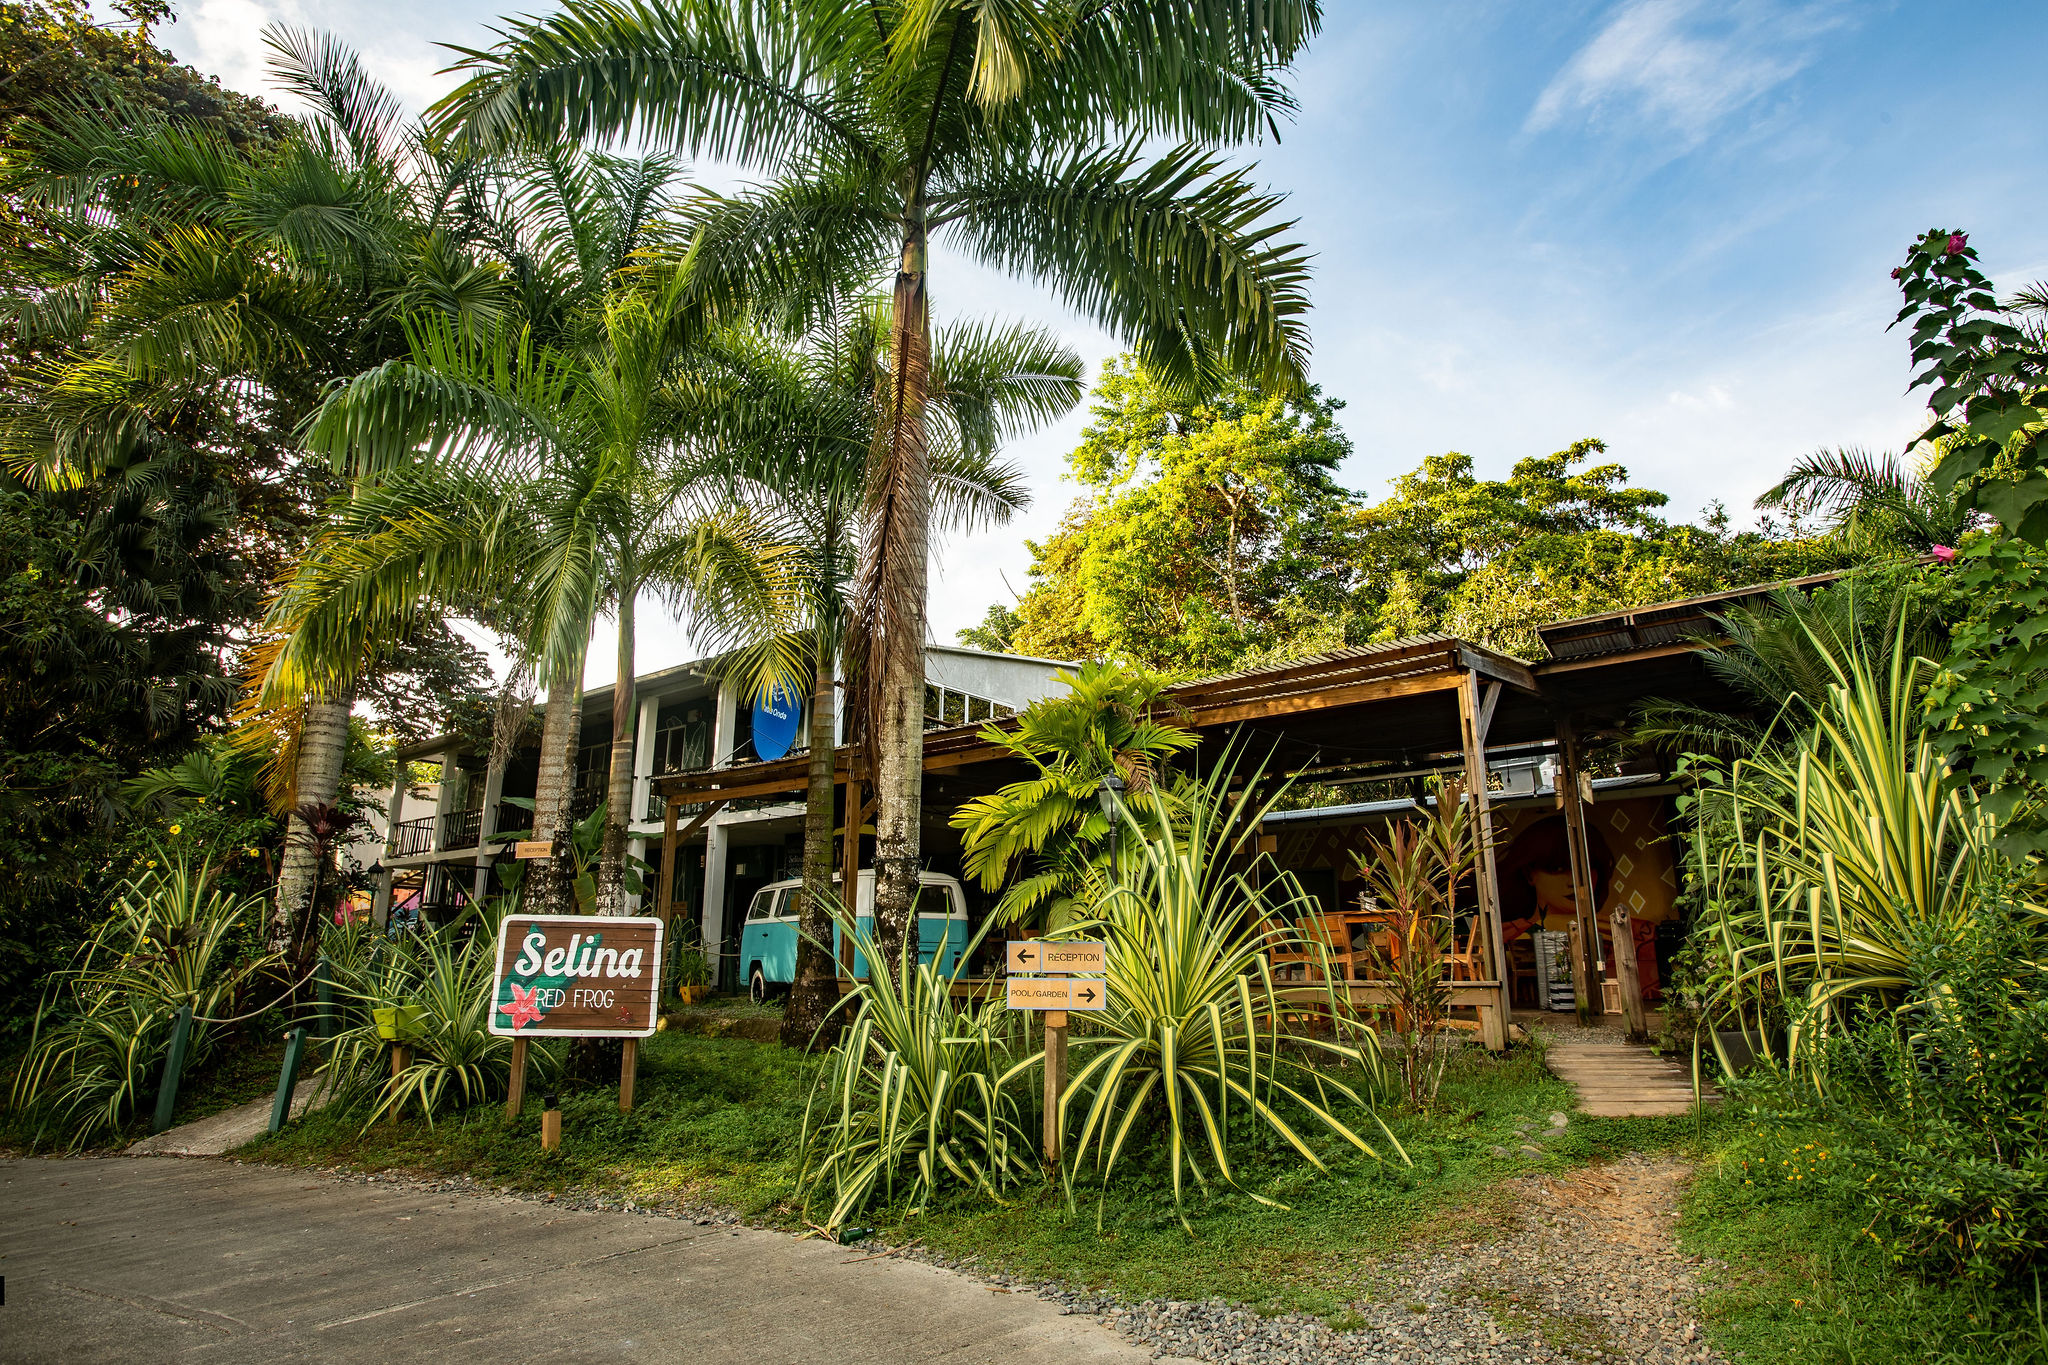 Selina Red Frog, Bocas del Toro